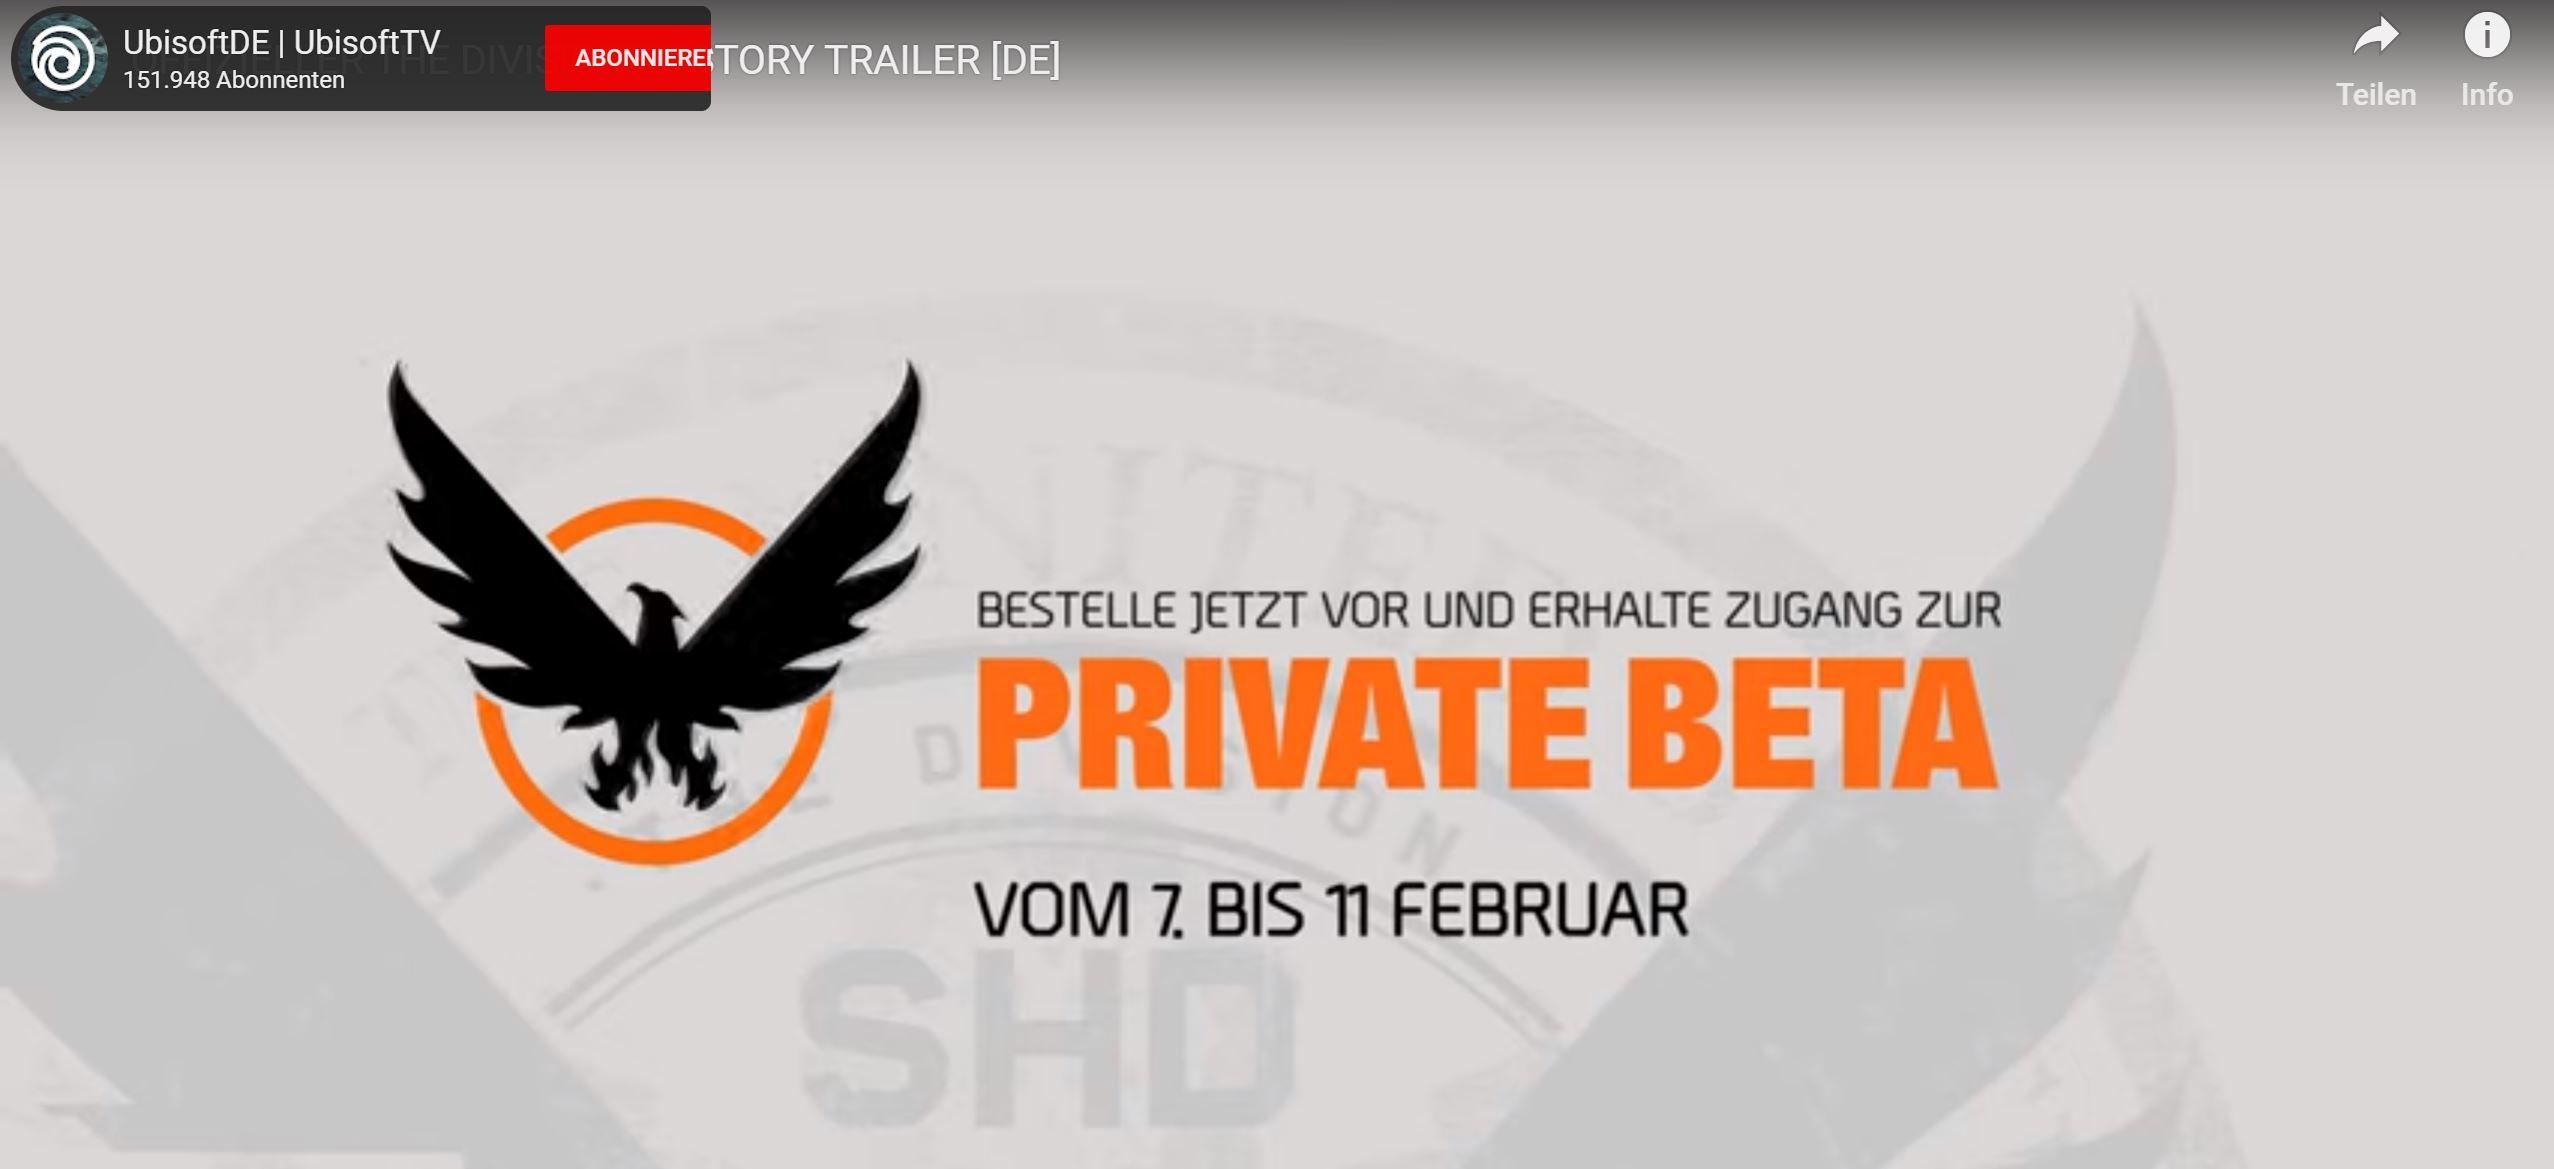 Ubisoft-Beta-private-trailer-division